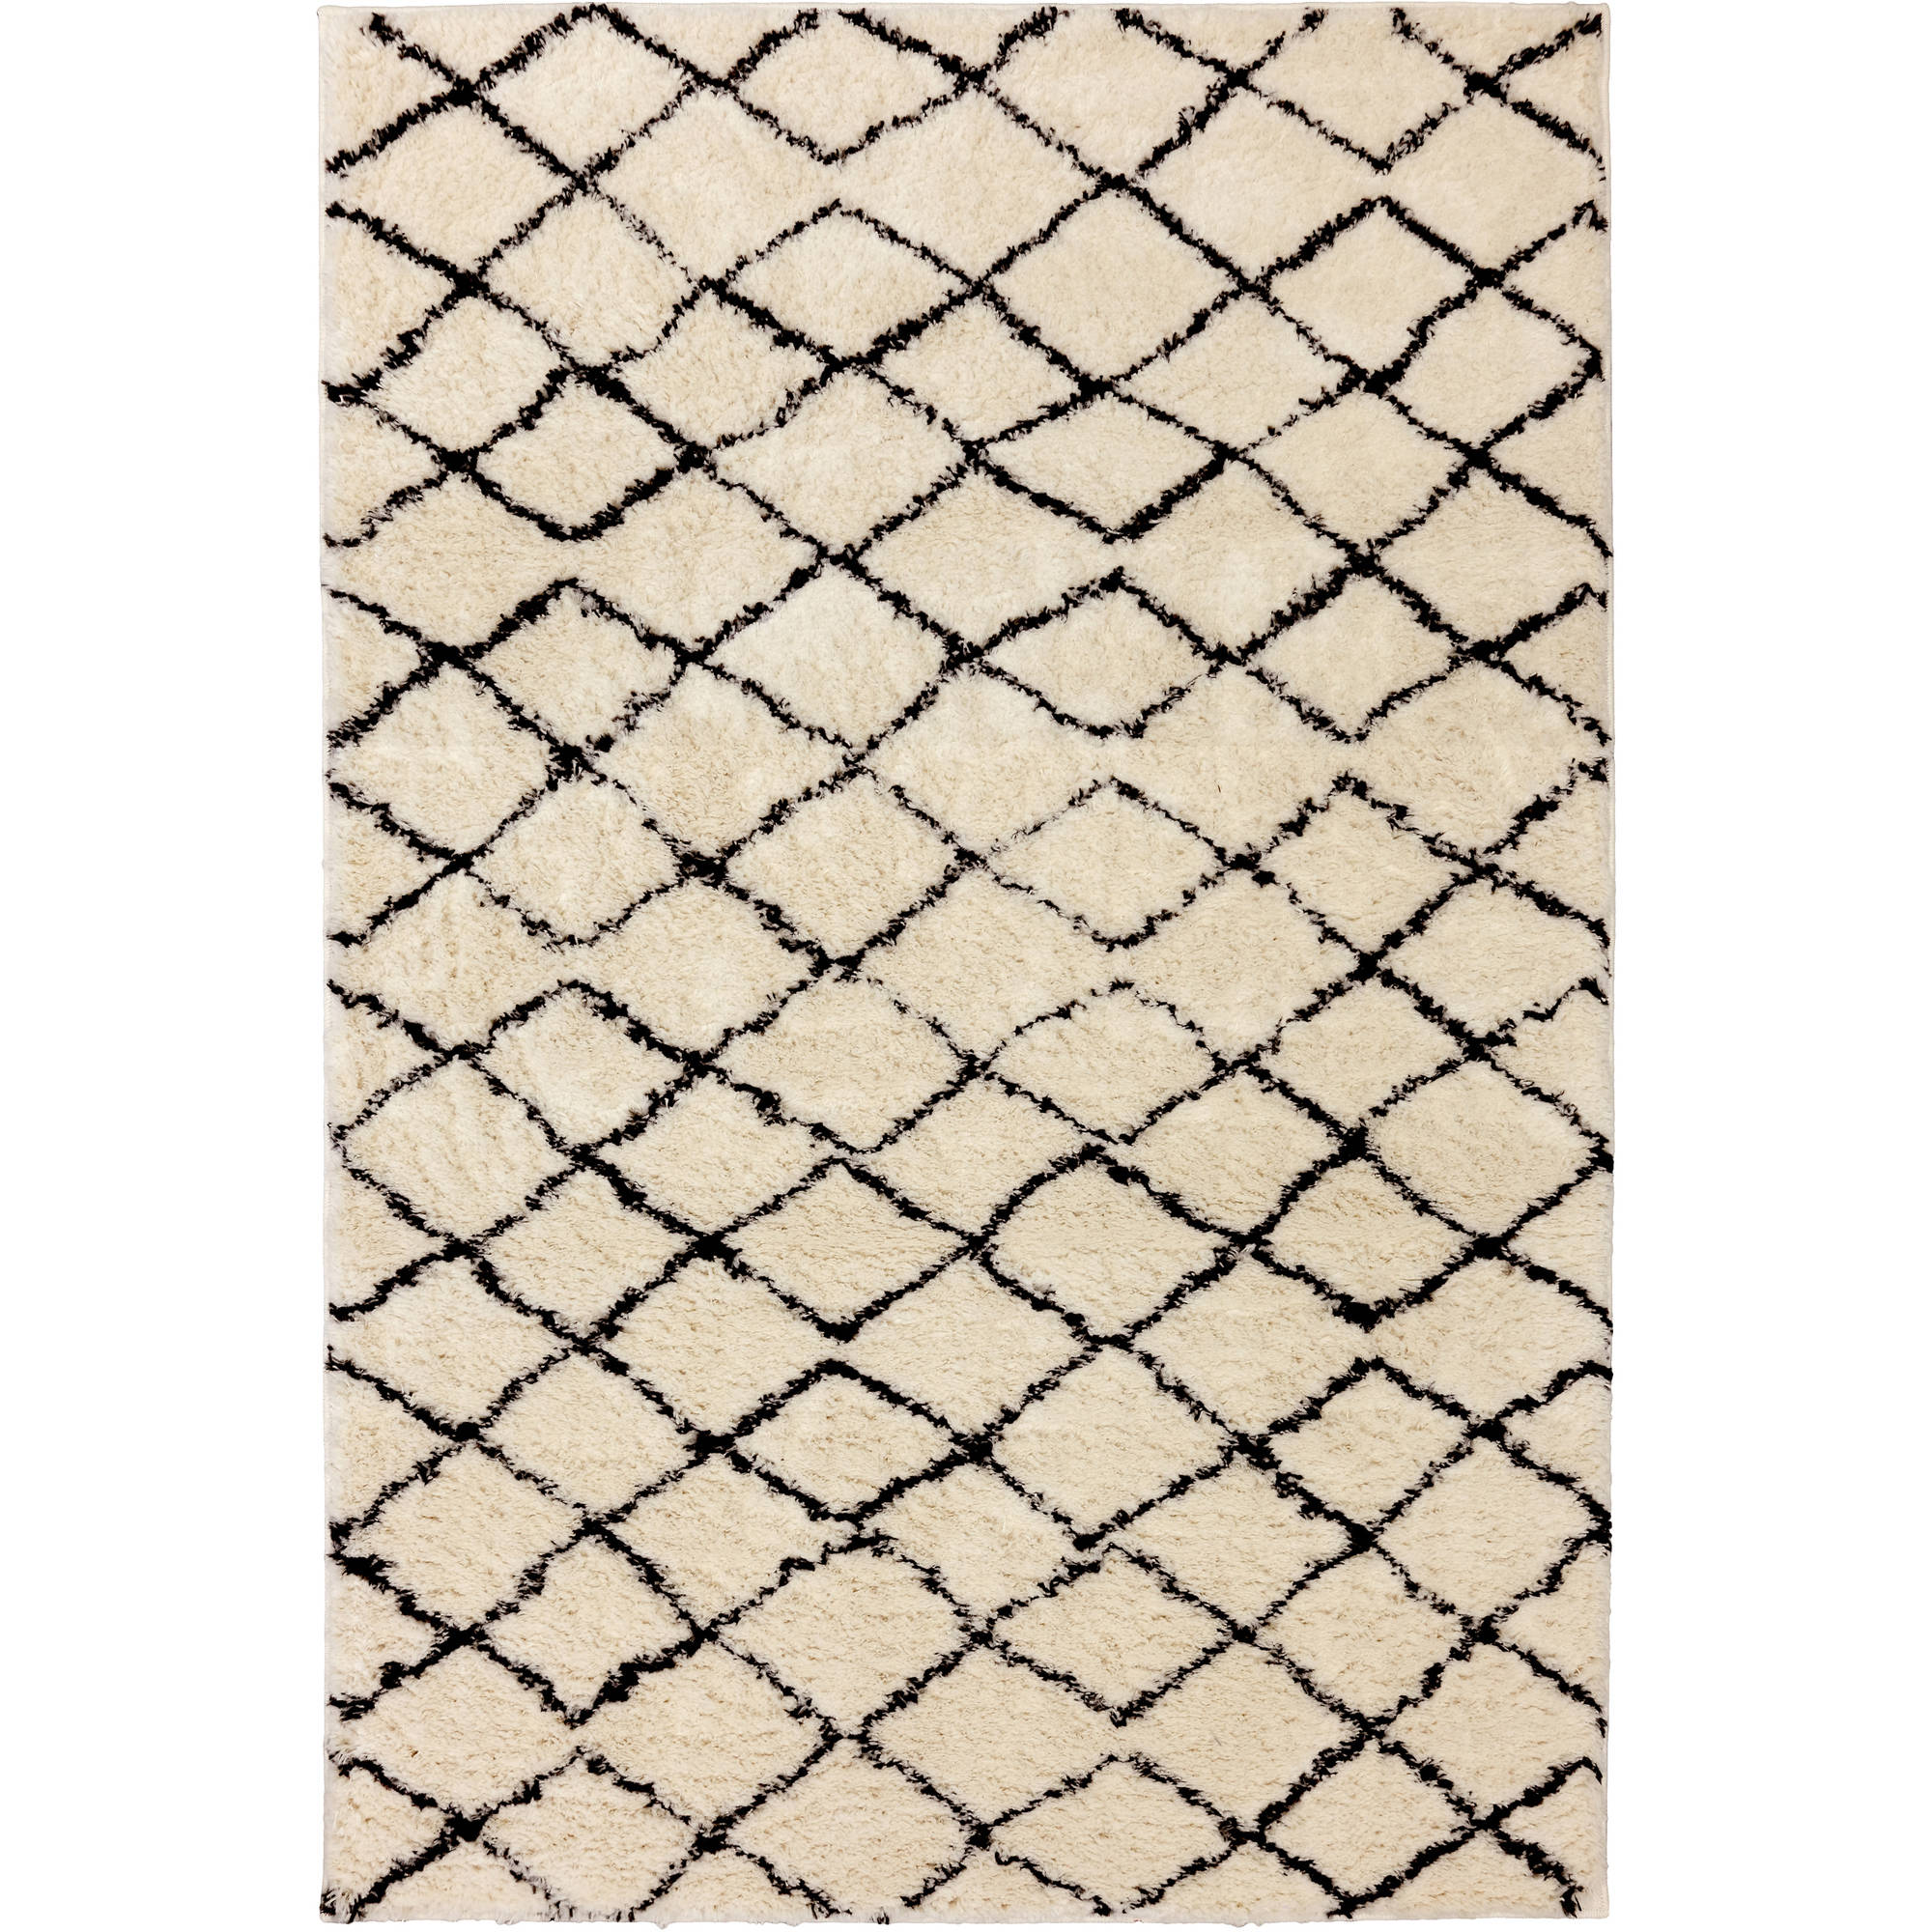 walmart rugs for living room gold curtains better homes gardens bhg merino plush 60x84 area rug com